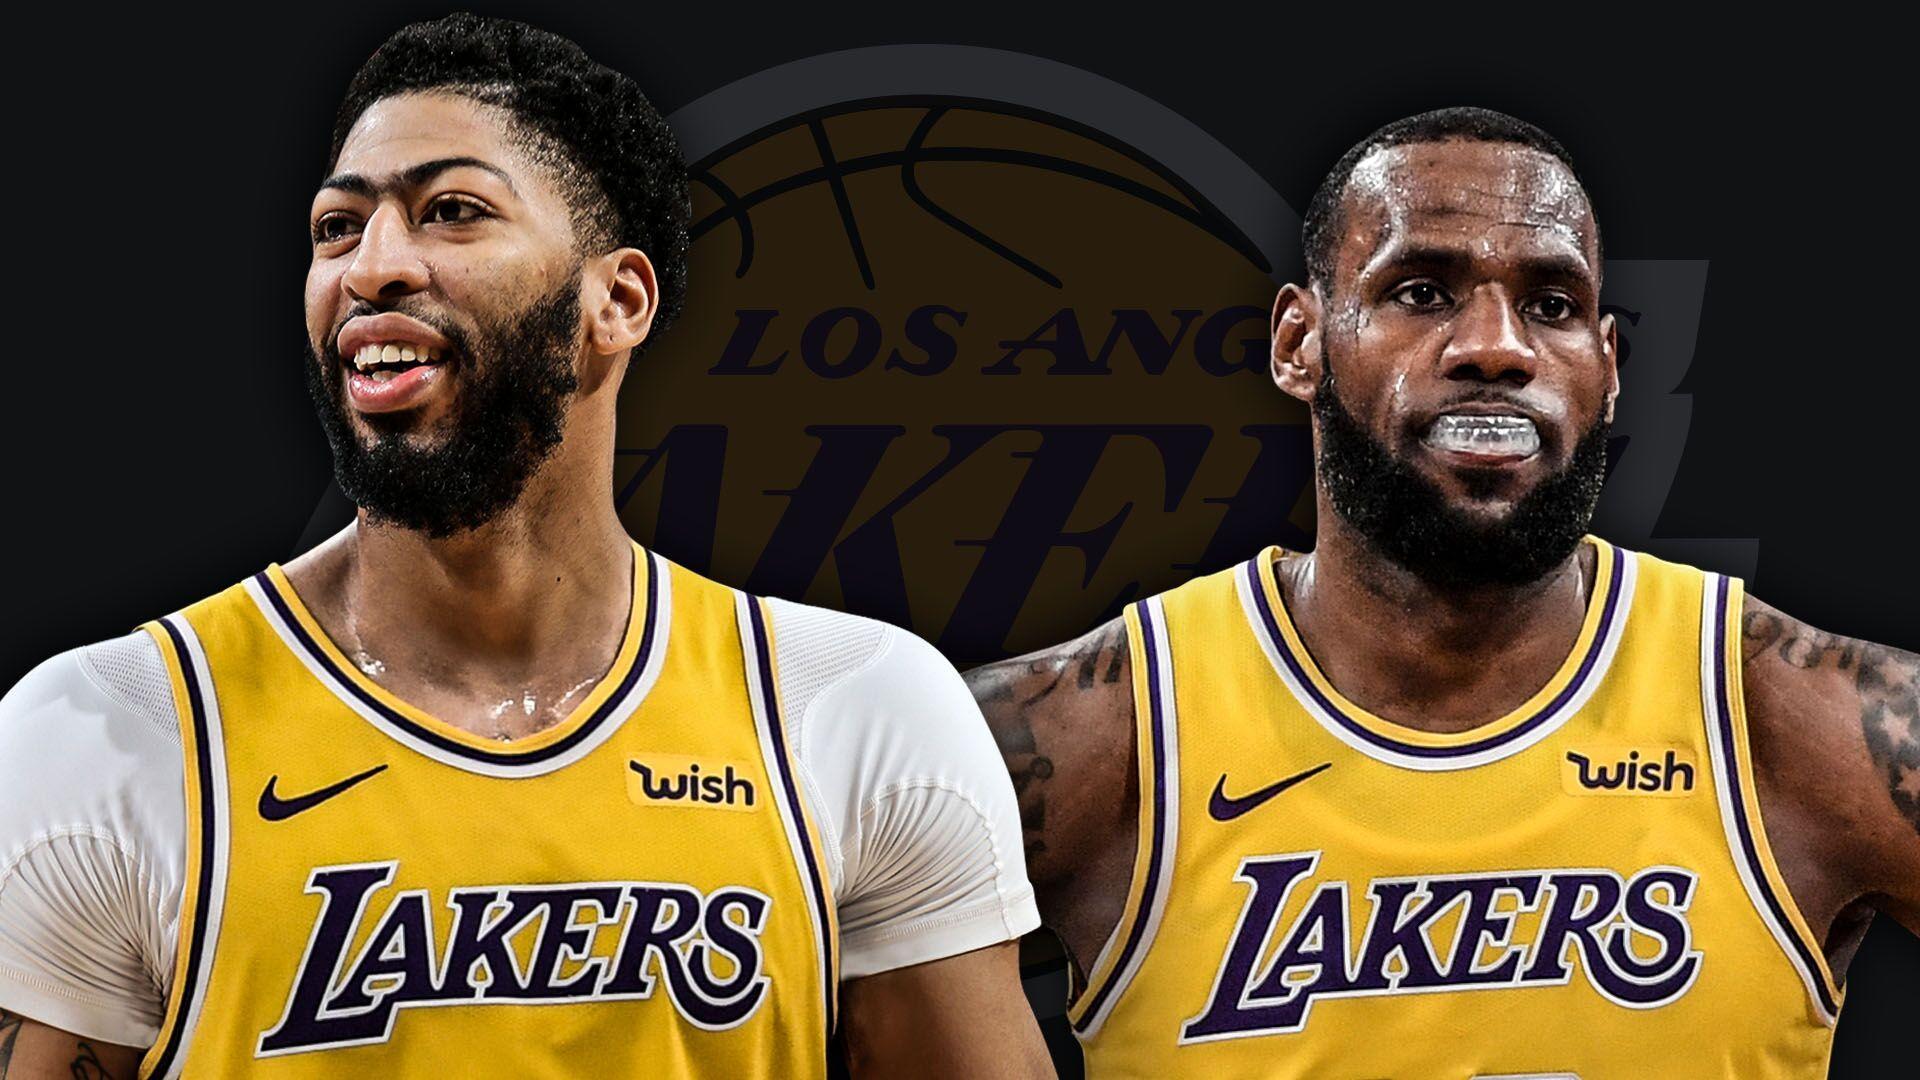 Lakers 2020 Wallpapers Wallpaper Cave